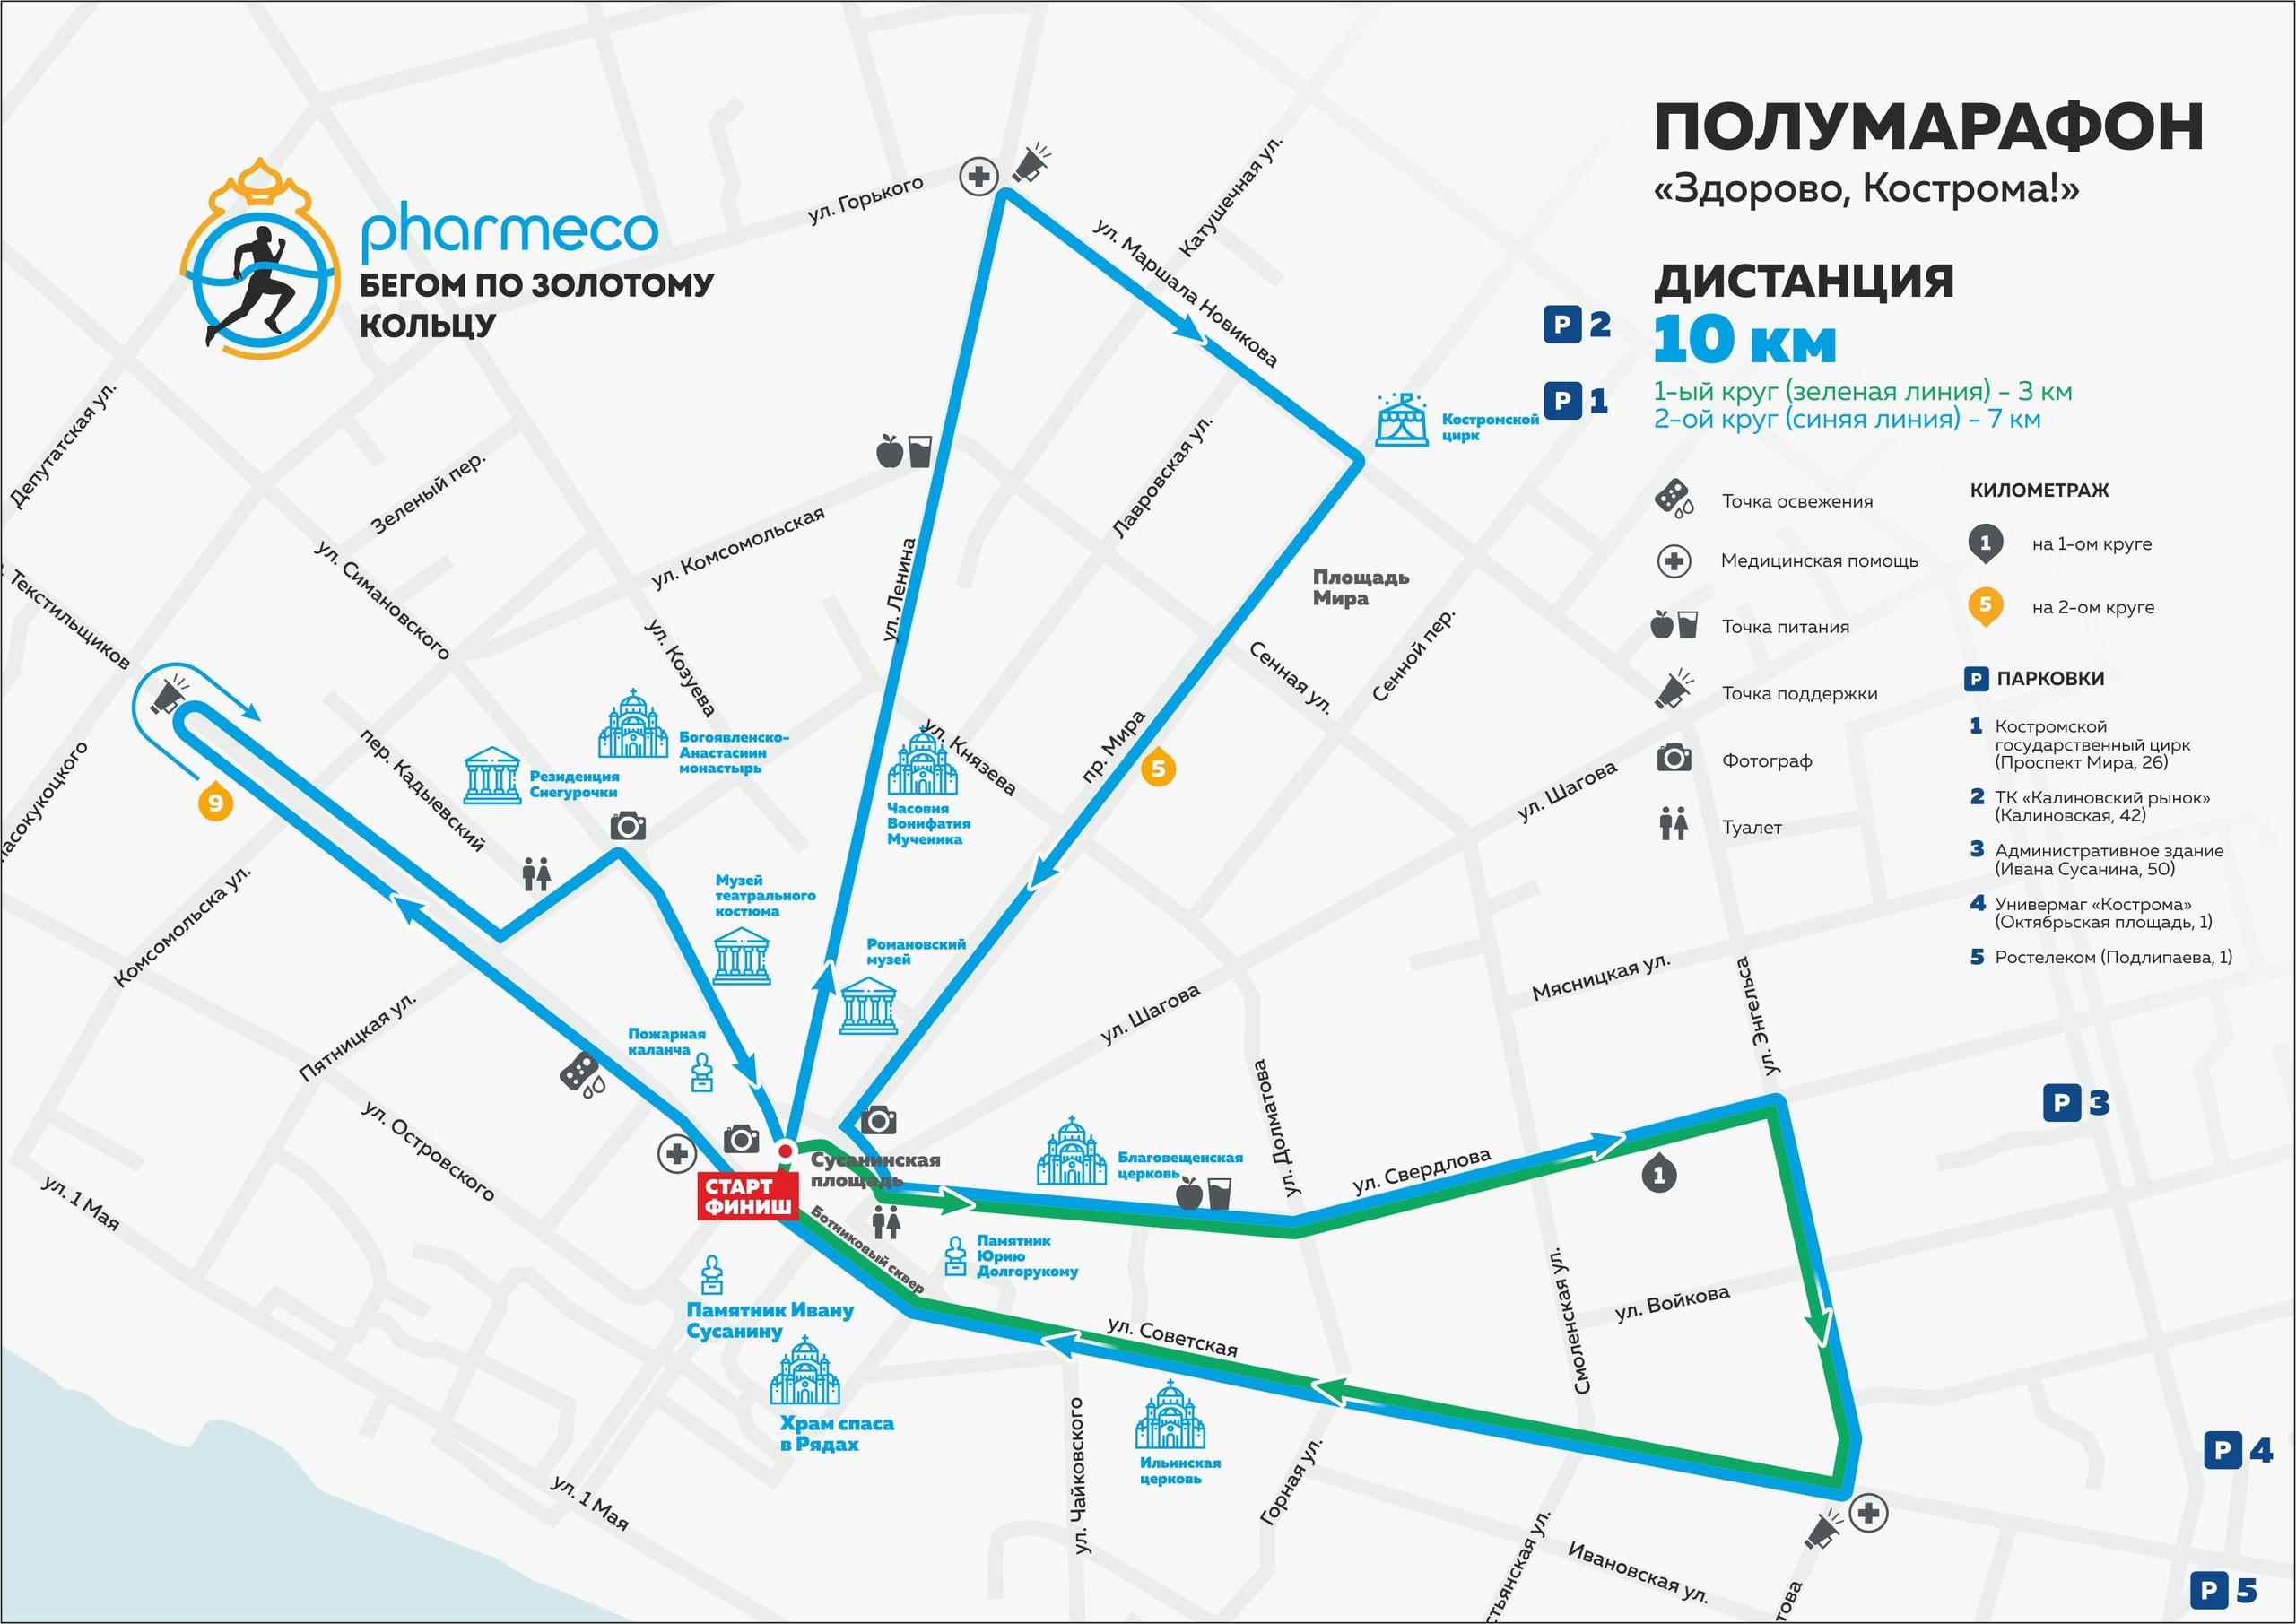 Карта дистанции 10 км Полумарафона Здорово, Кострома 2019